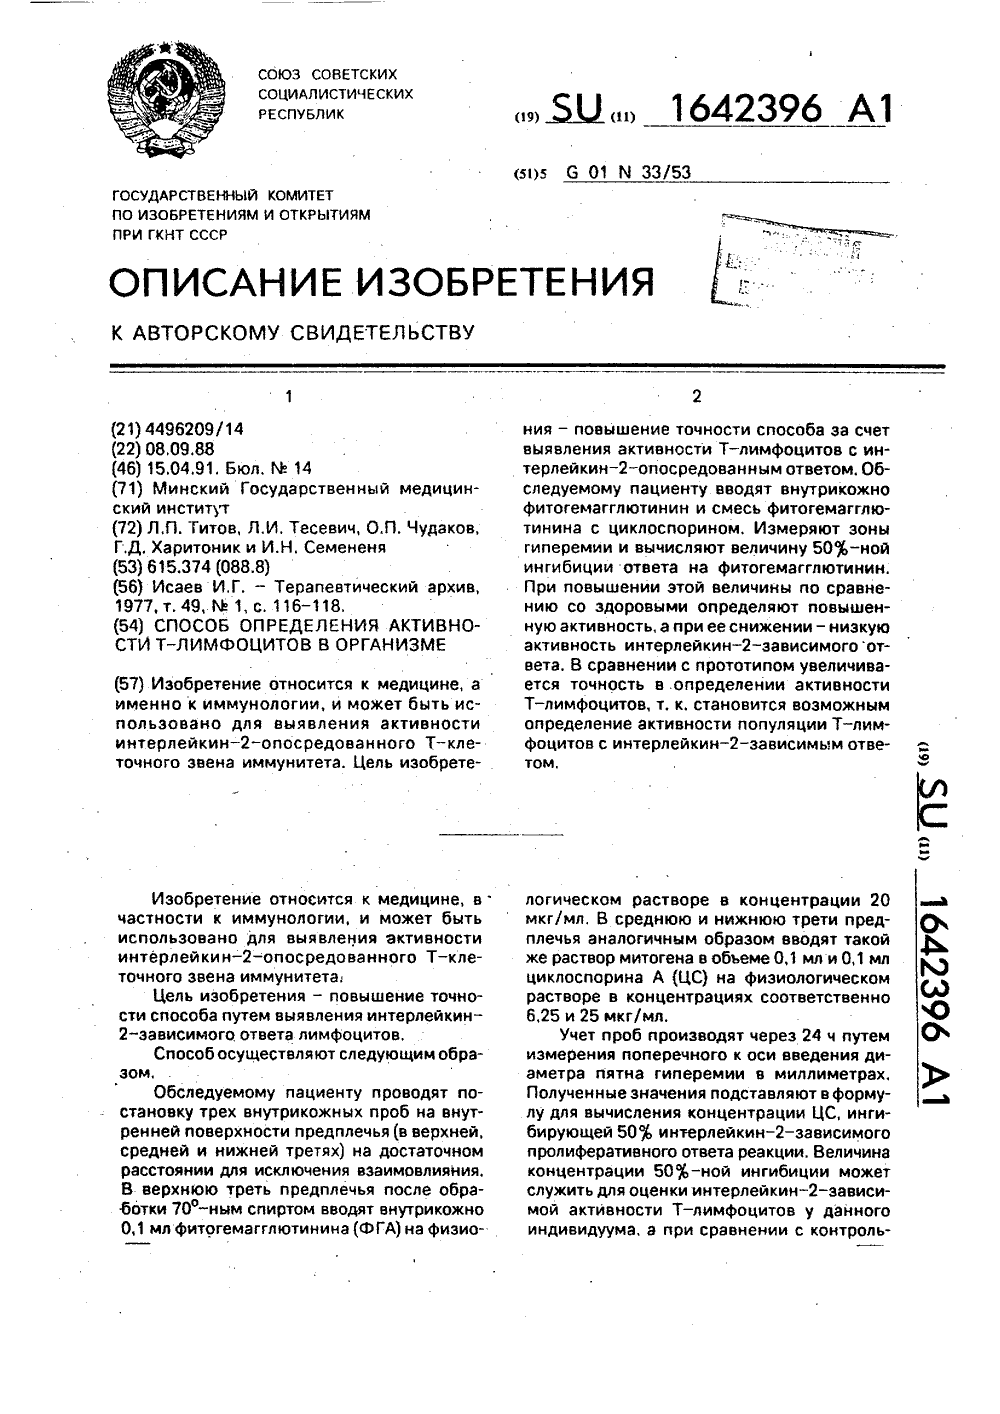 Фитогемагглютинин